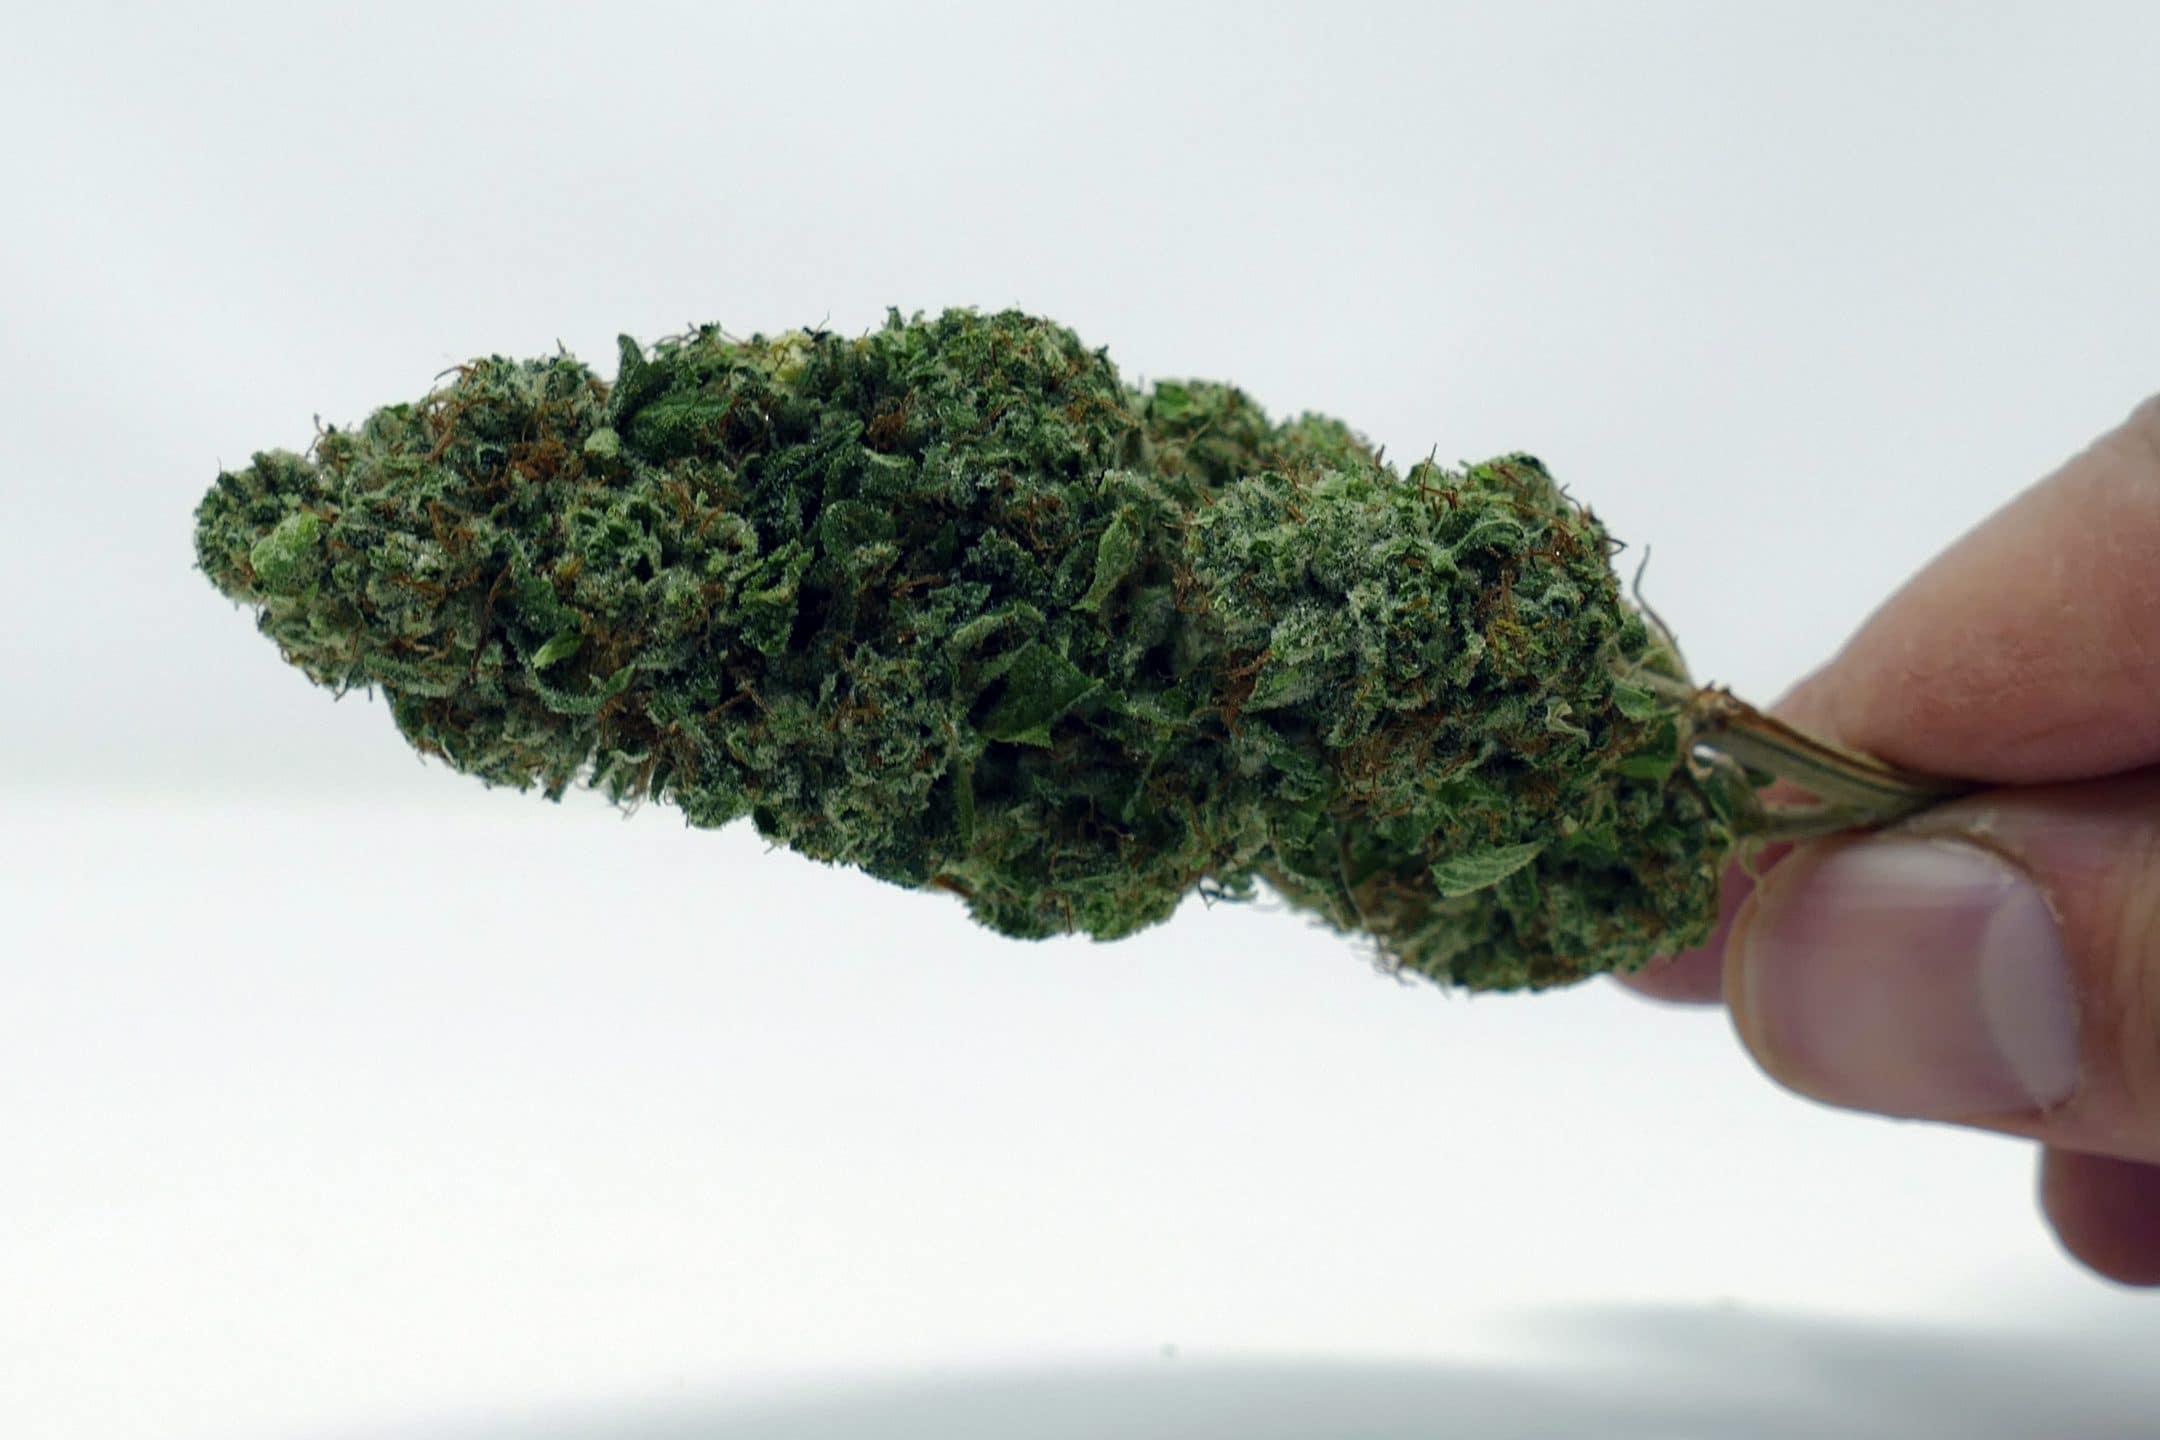 marmalade, Marmalade Cannabis Strain Review & Information